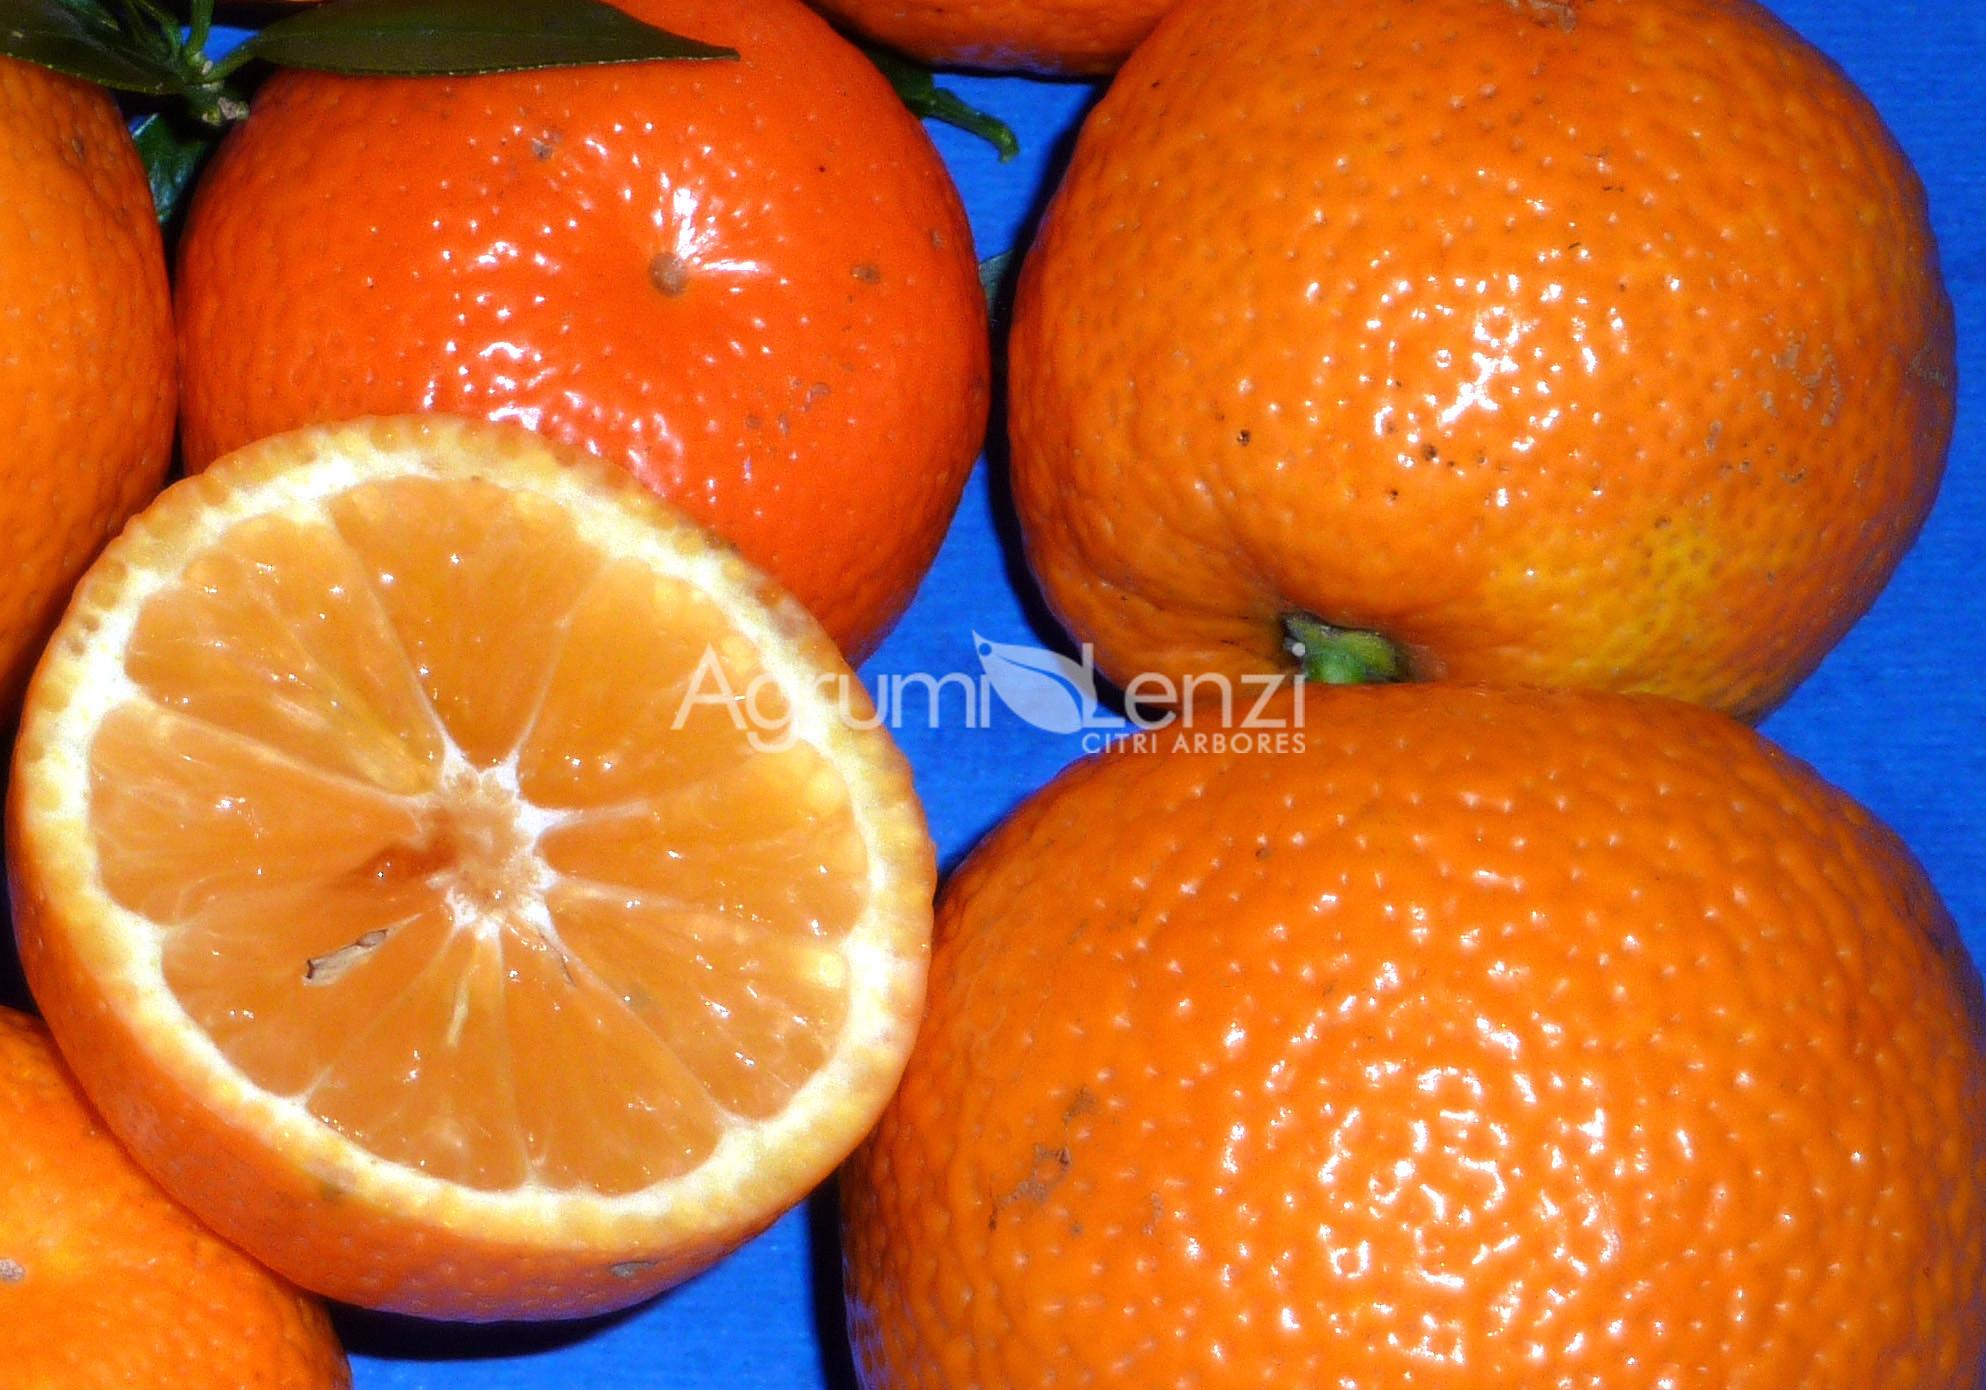 Chinotto comune citrus mirtyfolia agrumi lenzi for Citrus myrtifolia